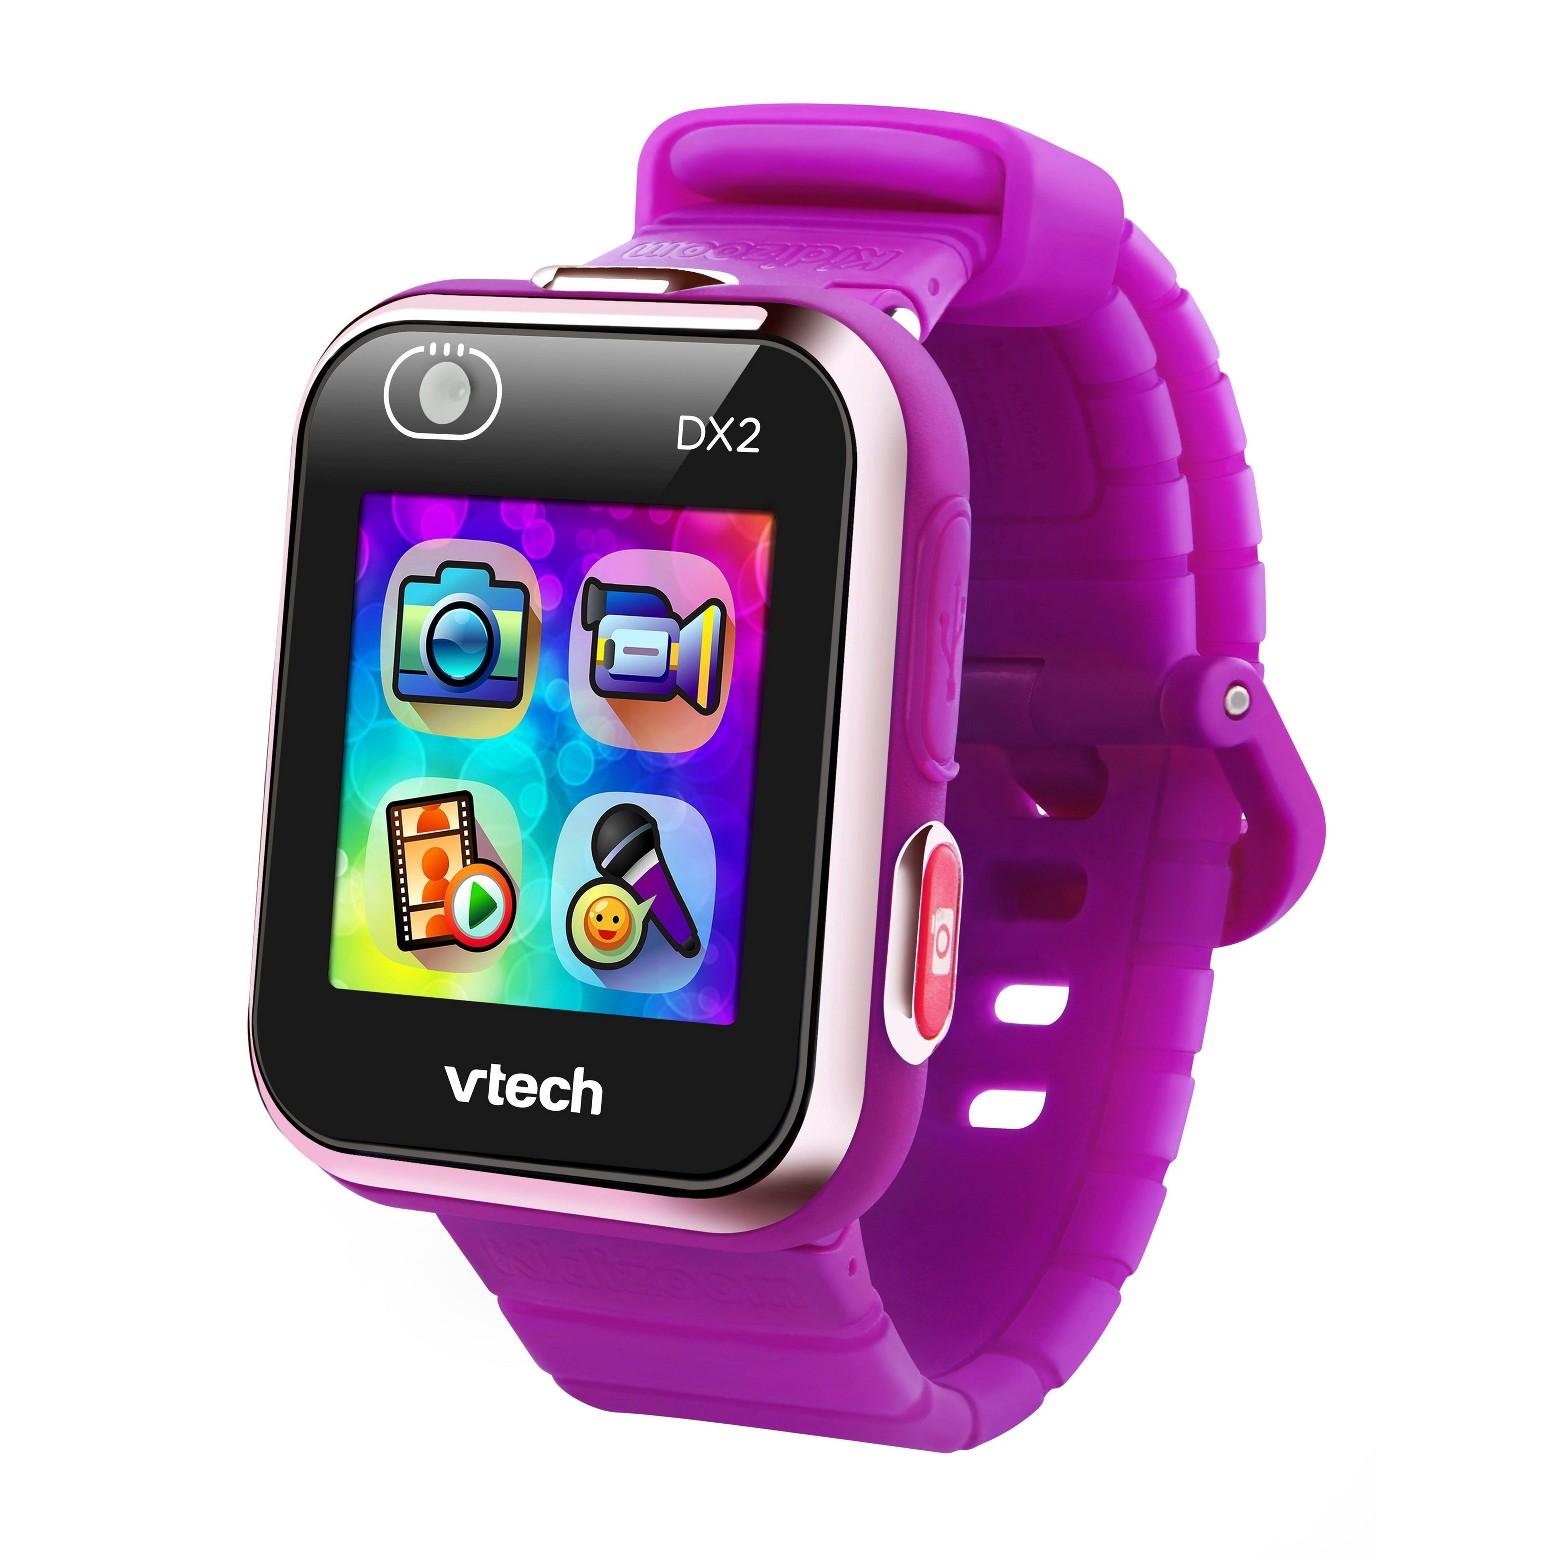 Vtech Kidizoom Smartwatch 2 - Blue or Purple $41